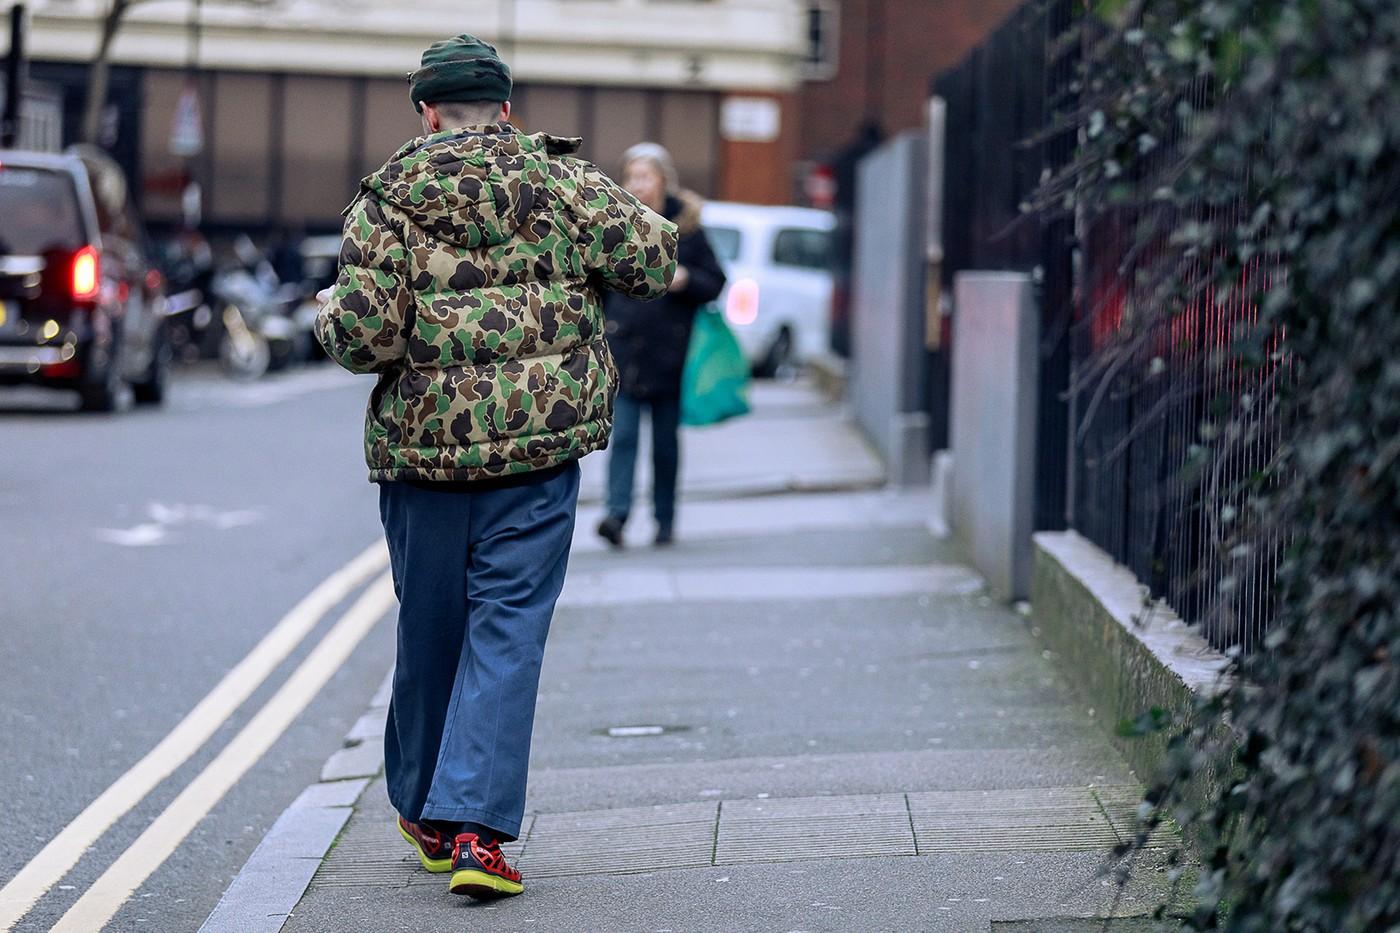 street-style-london-fashion-week-aw20-men-walking-with-camo-puffer-jacket